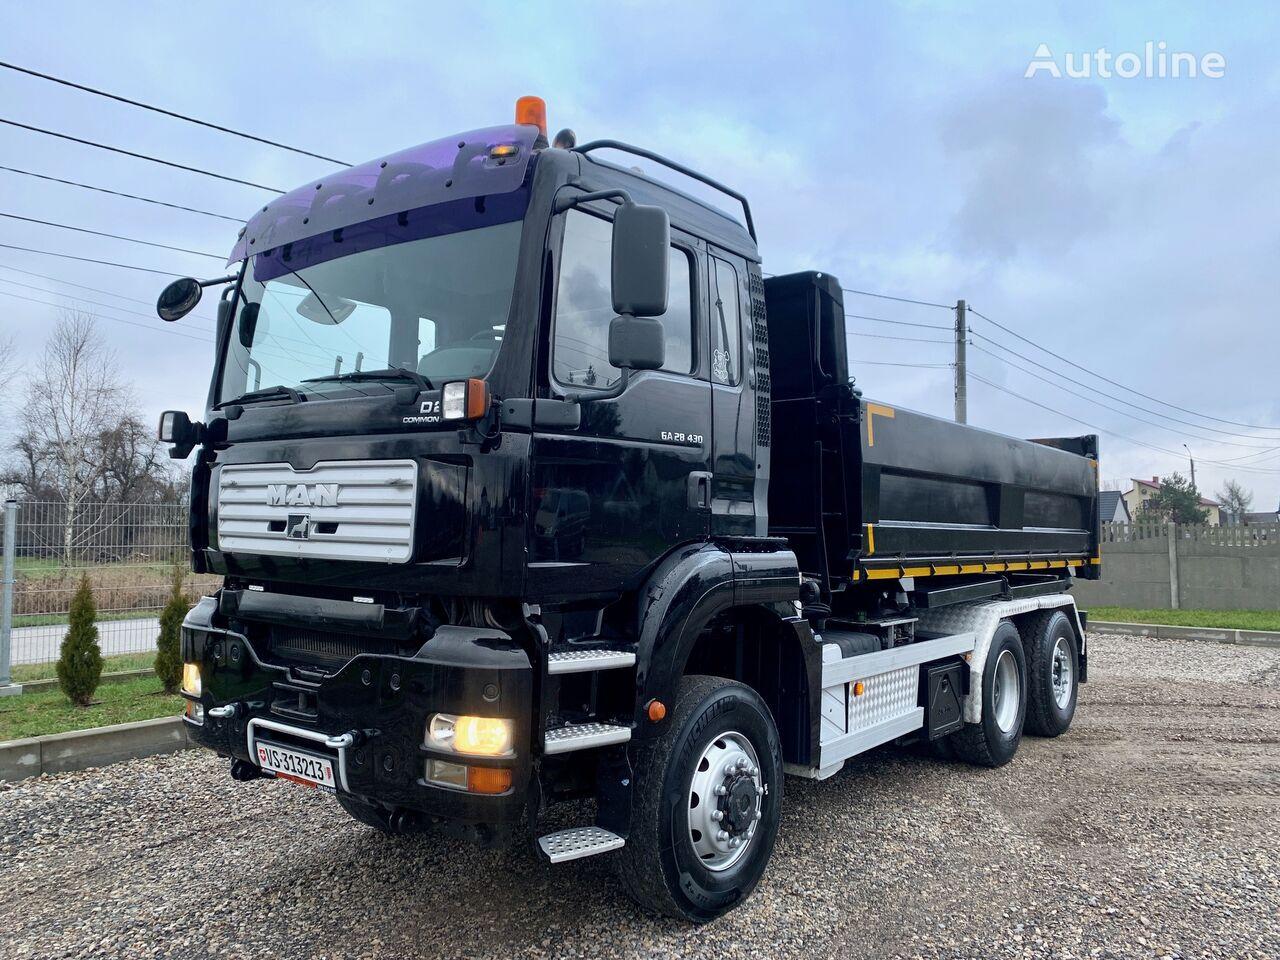 MAN TGA 28.430 dump truck